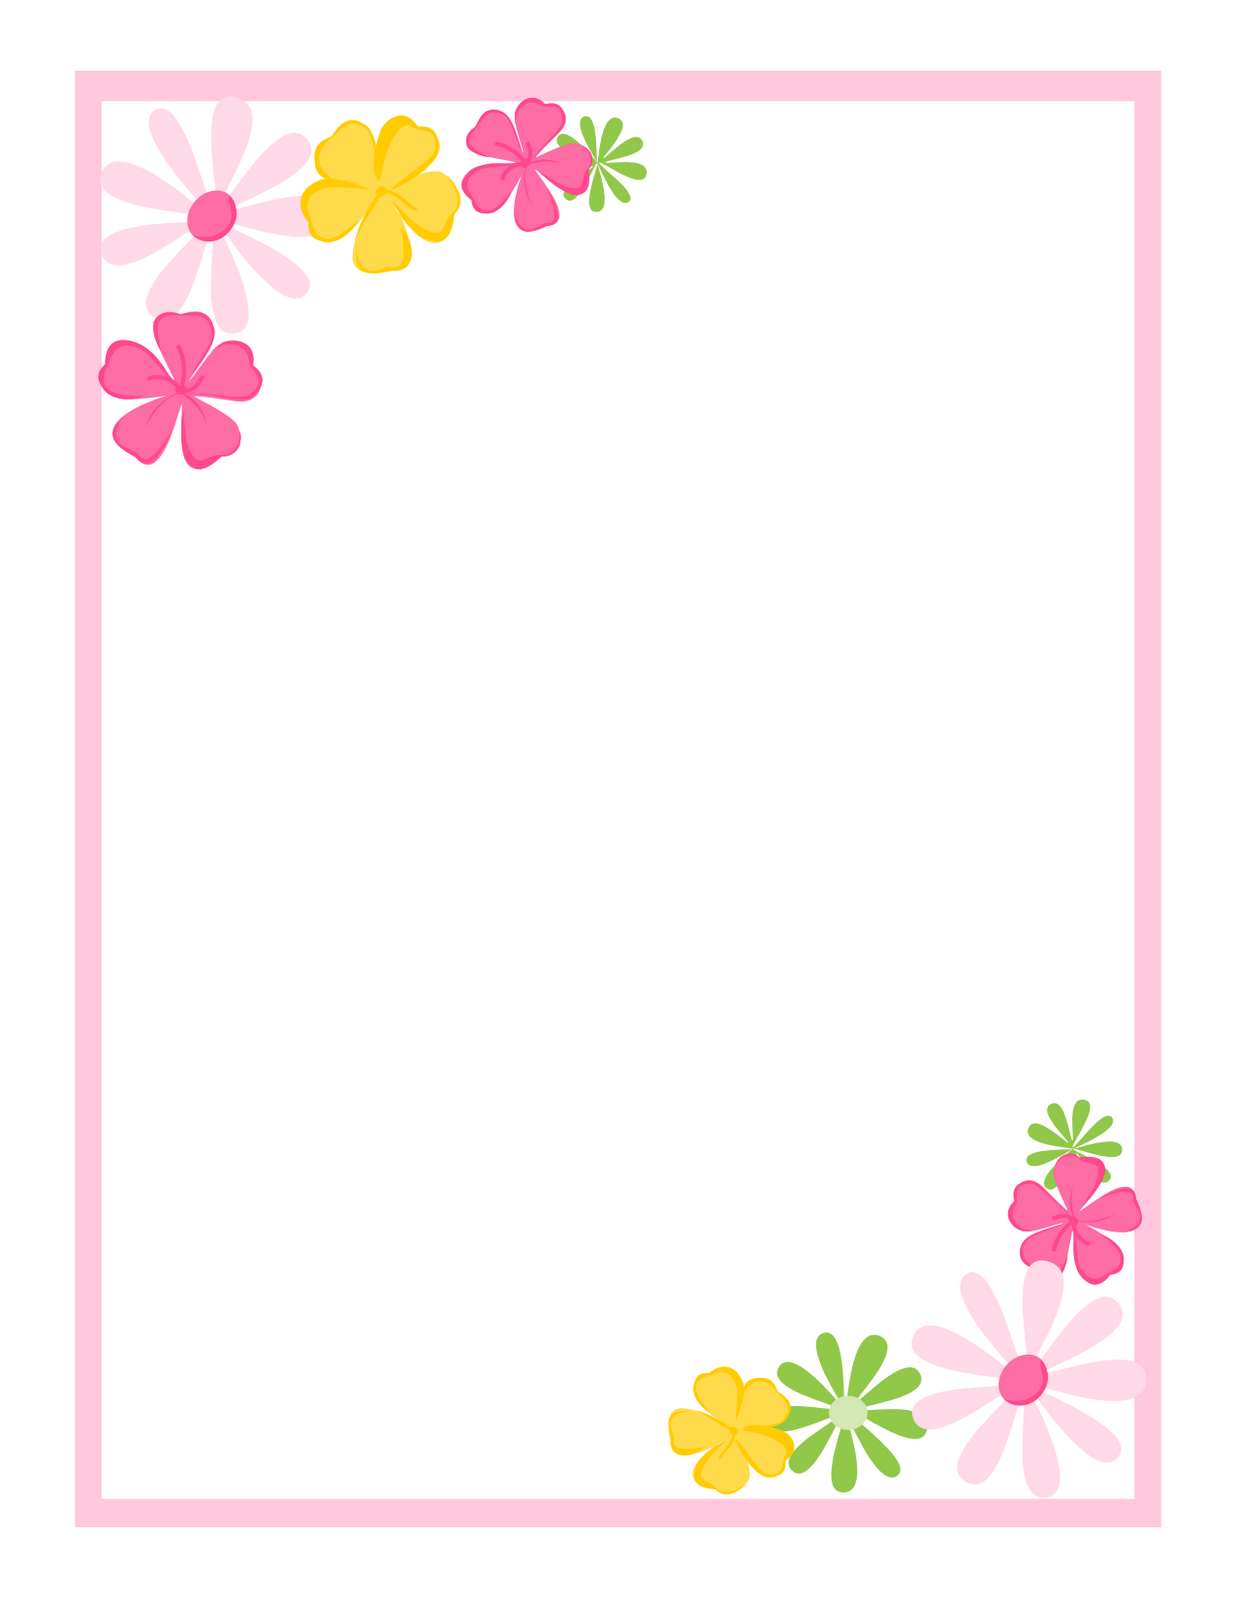 Aninimal Book: Tricia Rennea Designs | cards/scrapbook | Pinterest